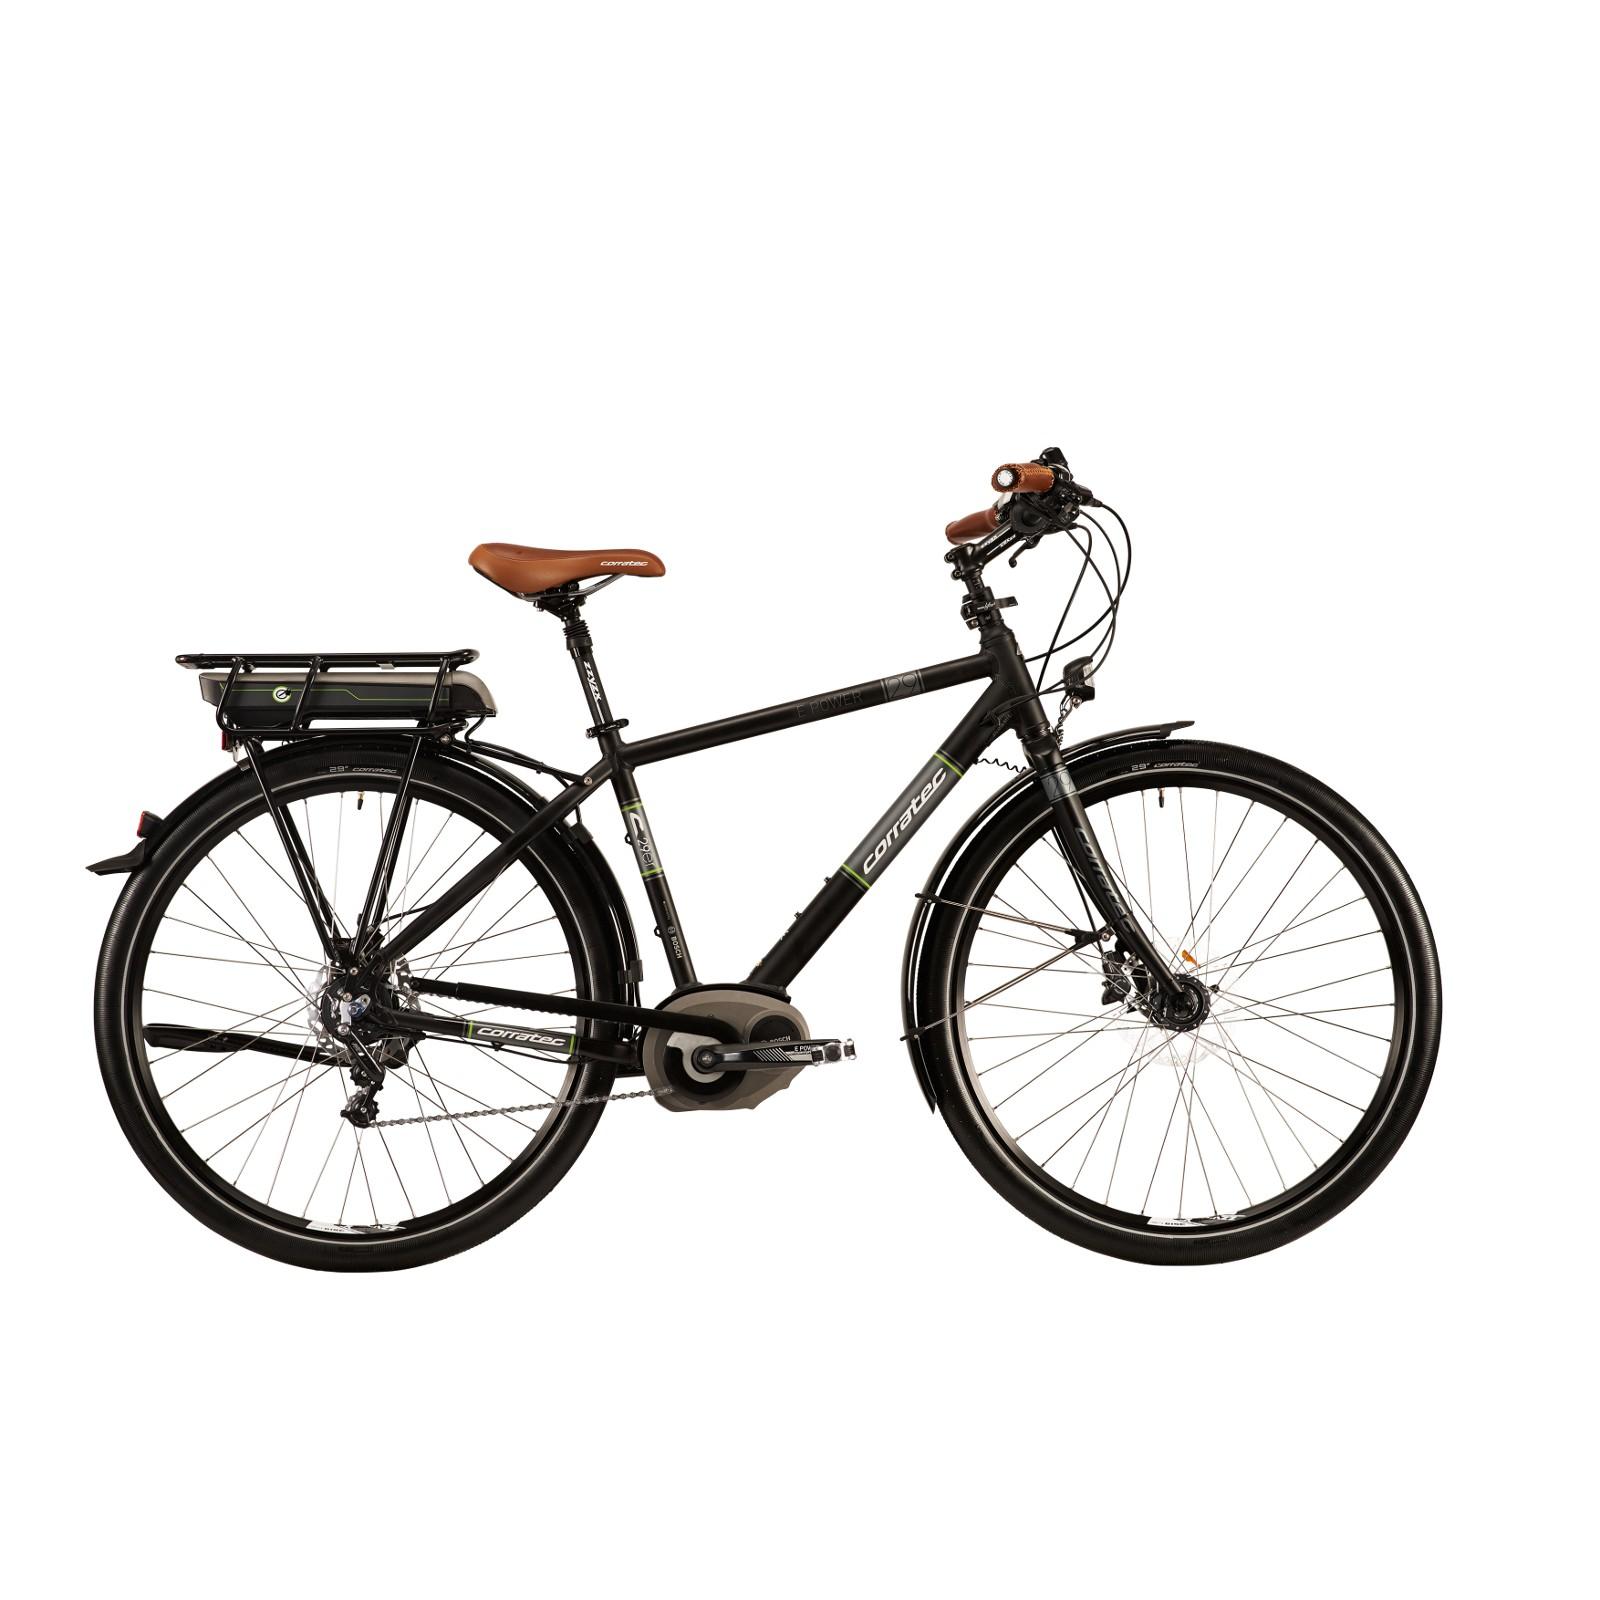 corratec e bike e power c29 trekking diamond 29 inch. Black Bedroom Furniture Sets. Home Design Ideas